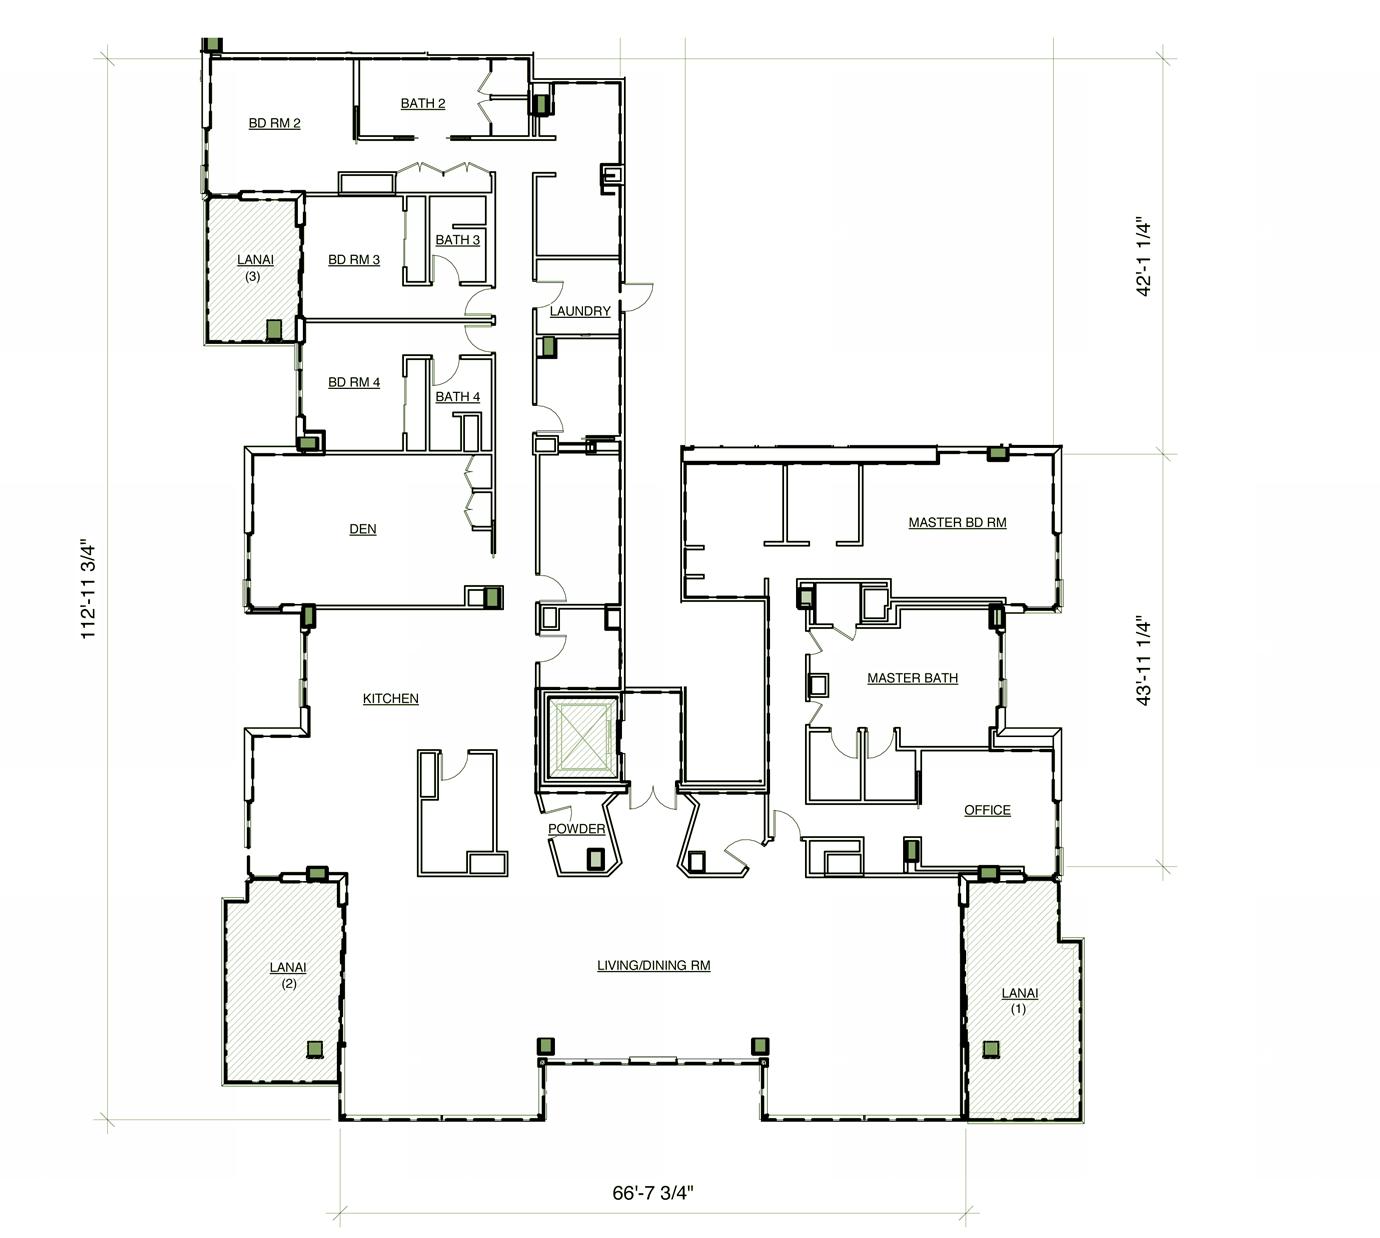 Penthouse B1